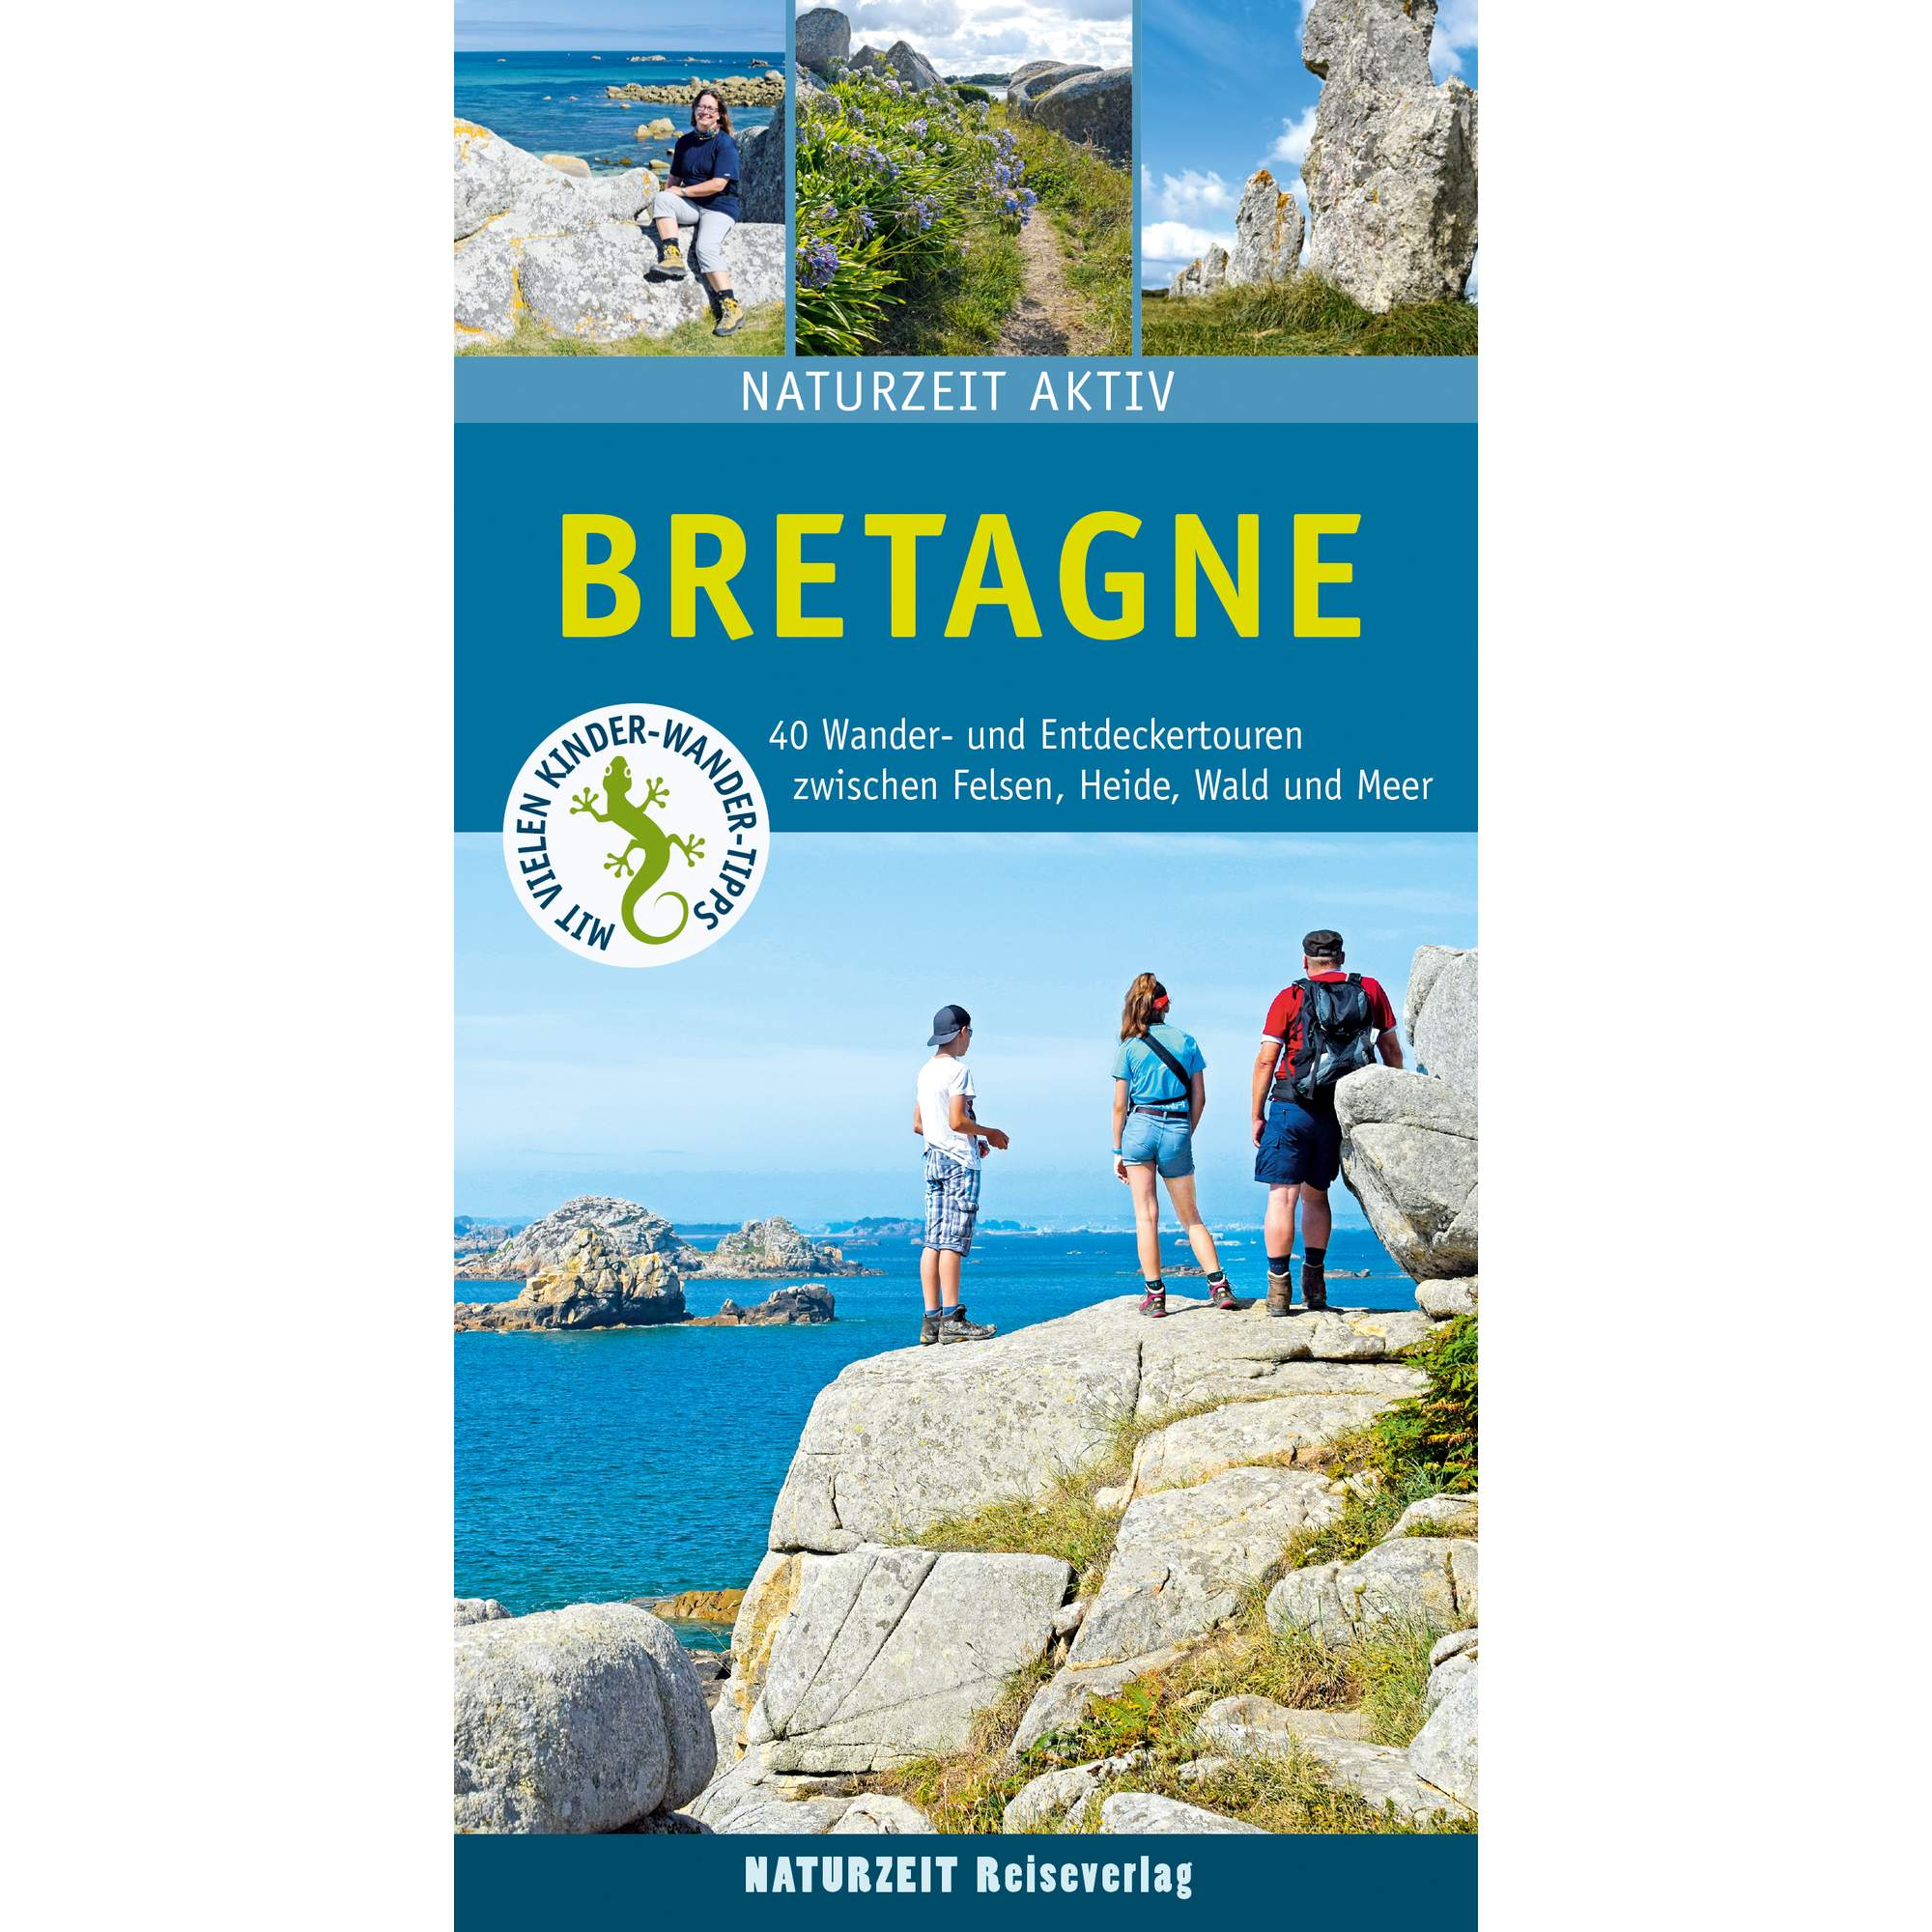 Bretagne, 16,90 Euro